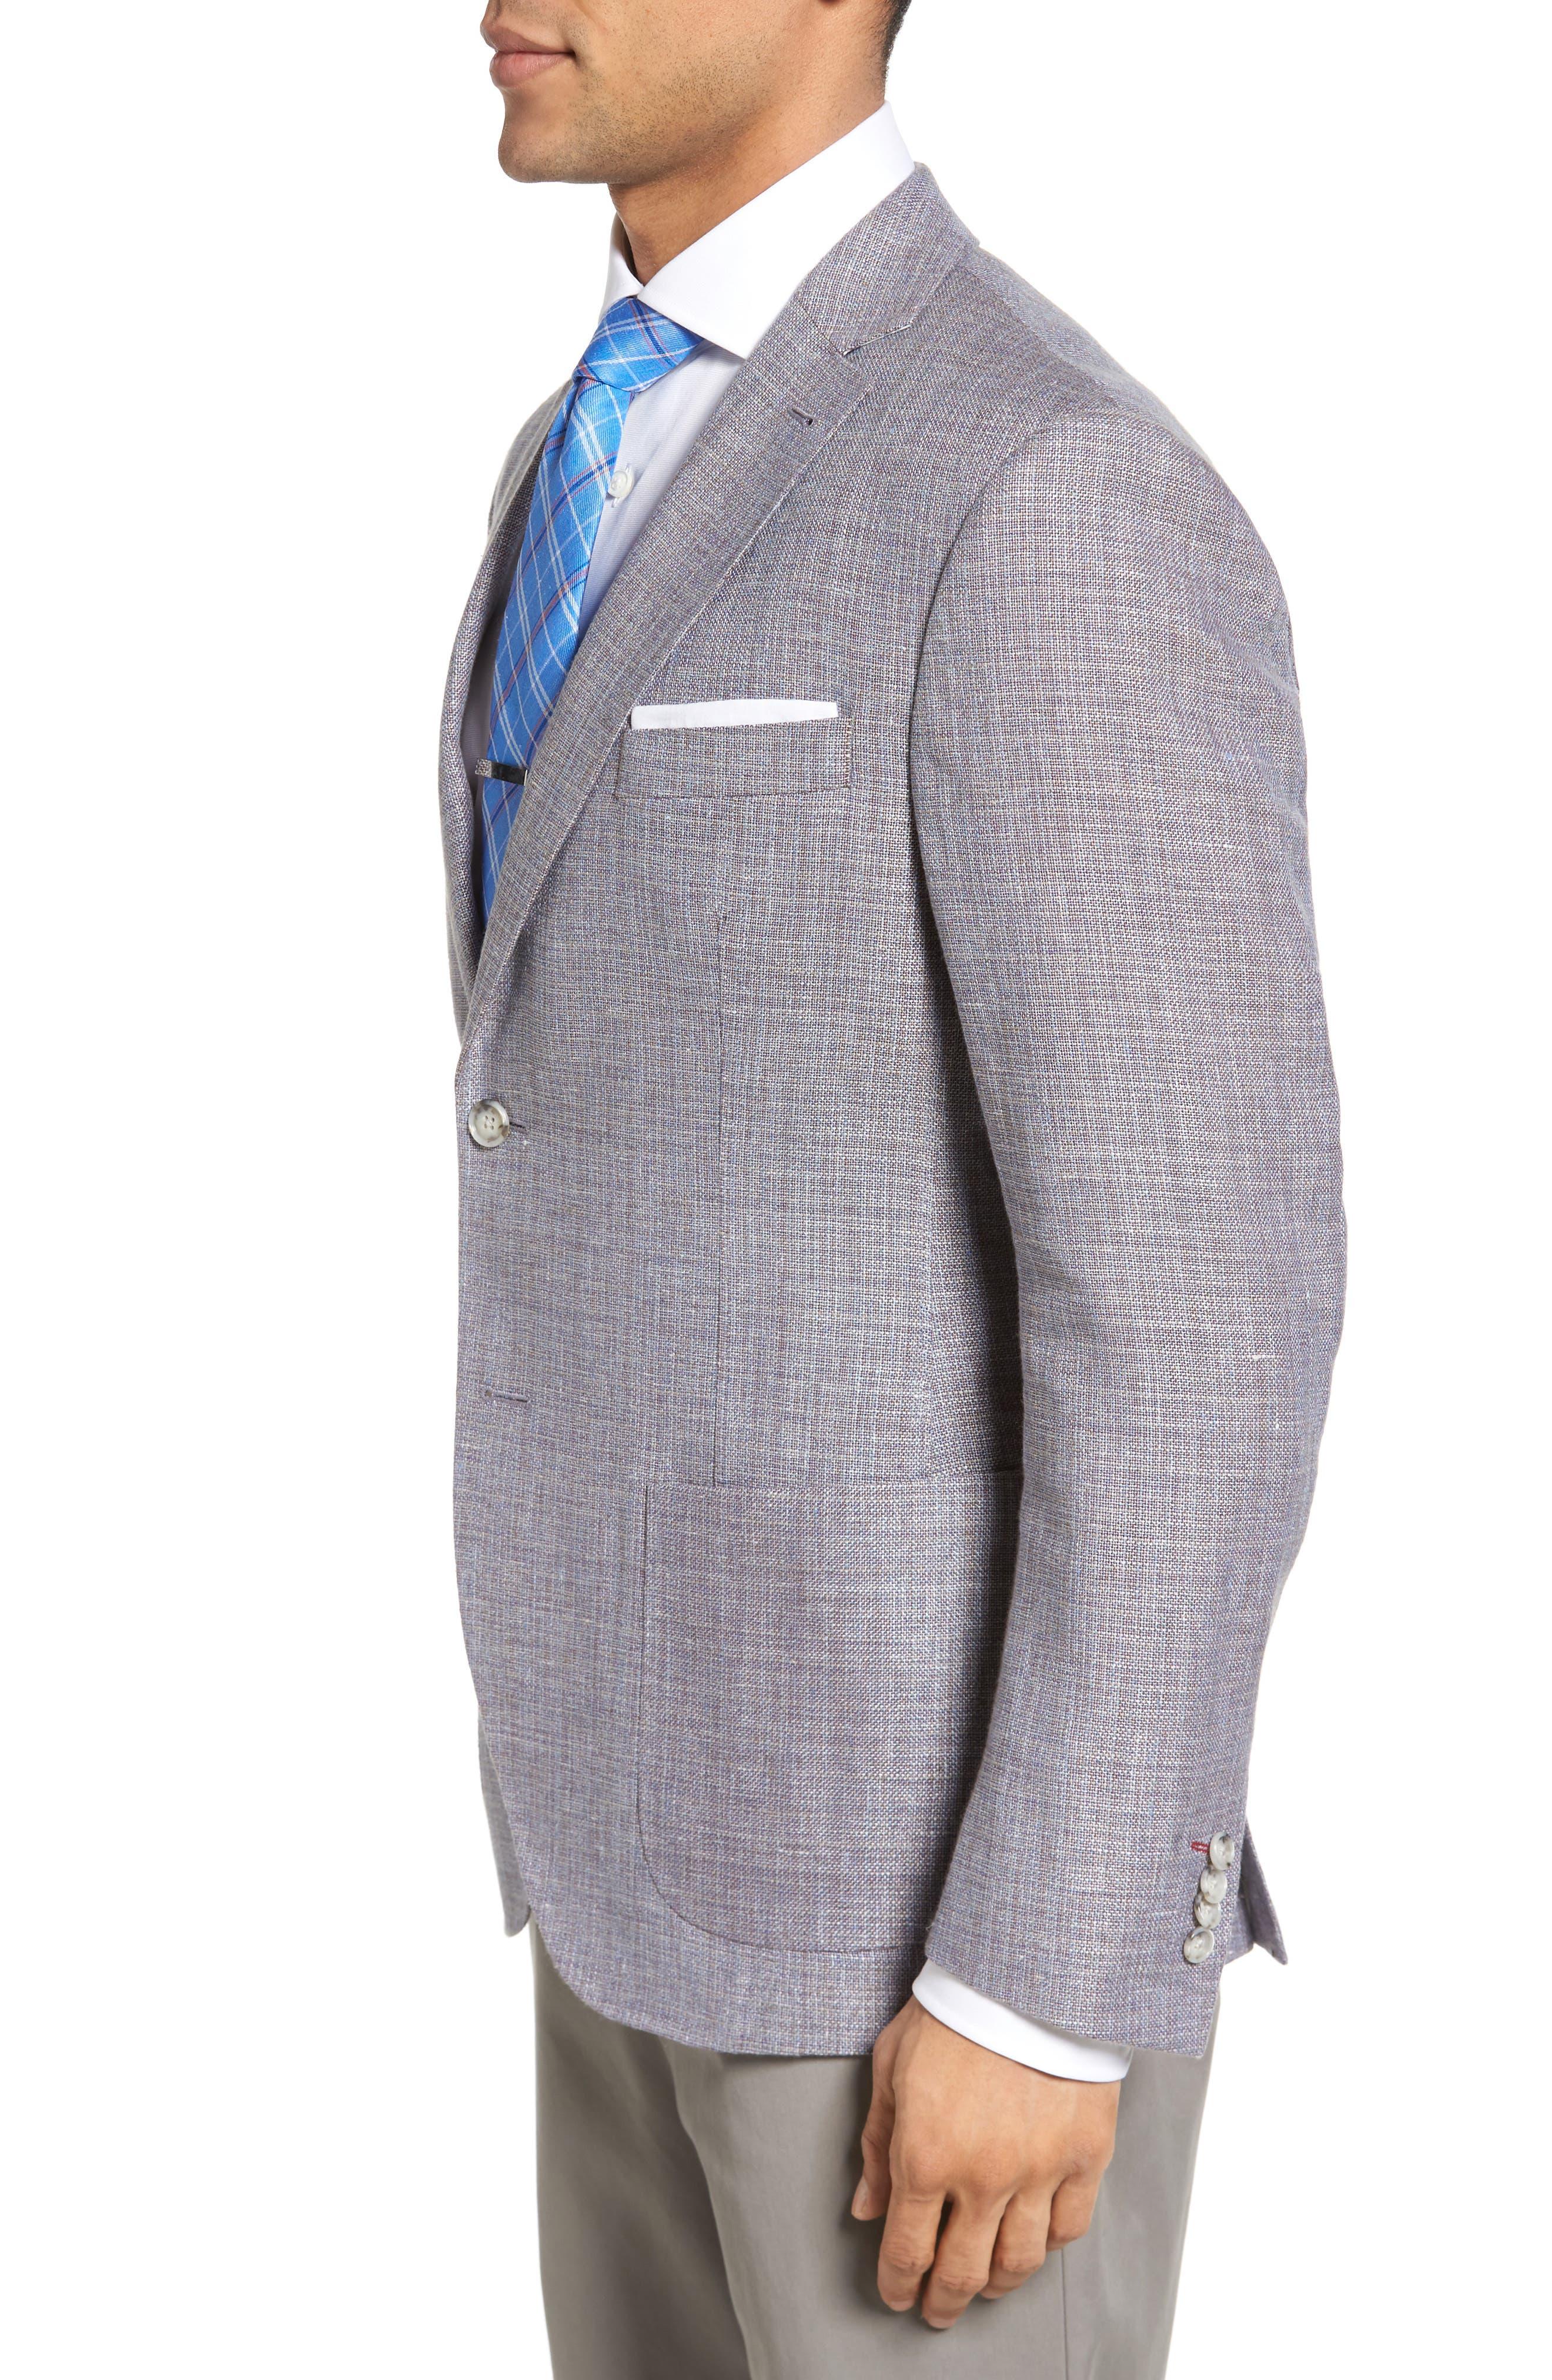 JKT NEW YORK,                             Trim Fit Wool & Linen Blazer,                             Alternate thumbnail 3, color,                             020